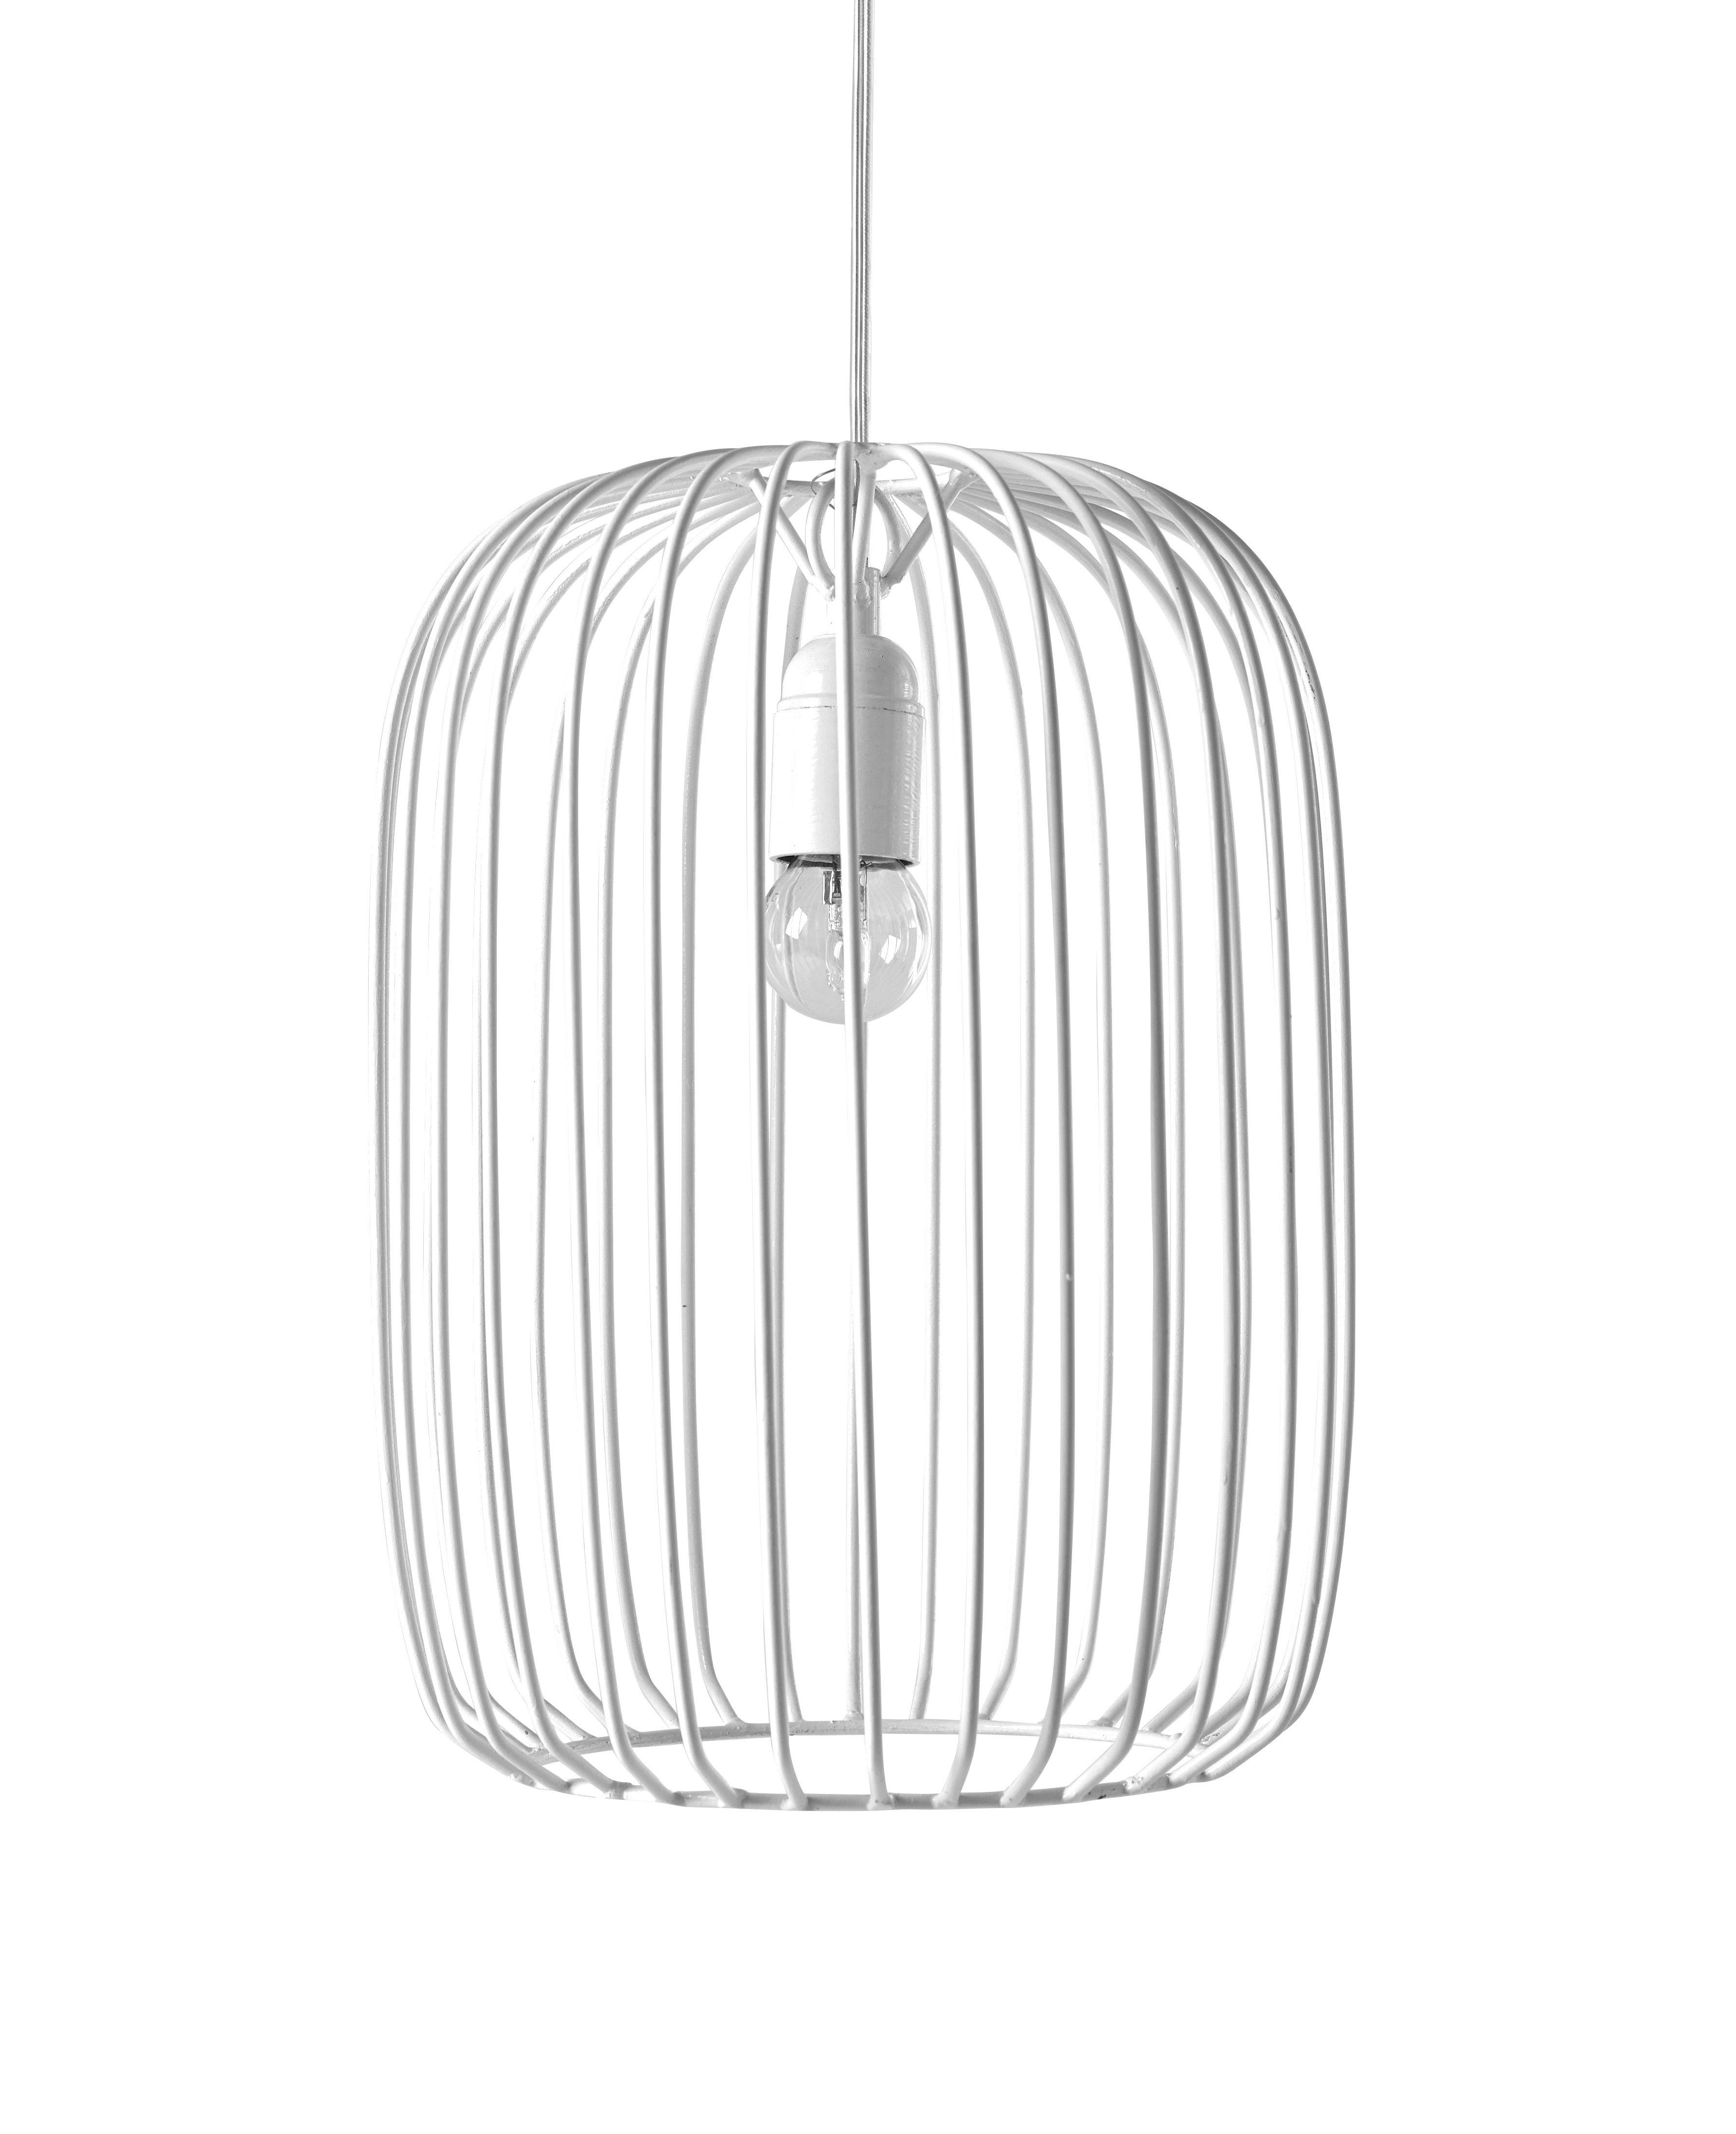 Lighting - Pendant Lighting - Marella Pendant - / Metal - Ø 25 x H 34 cm by Serax - White - Metal